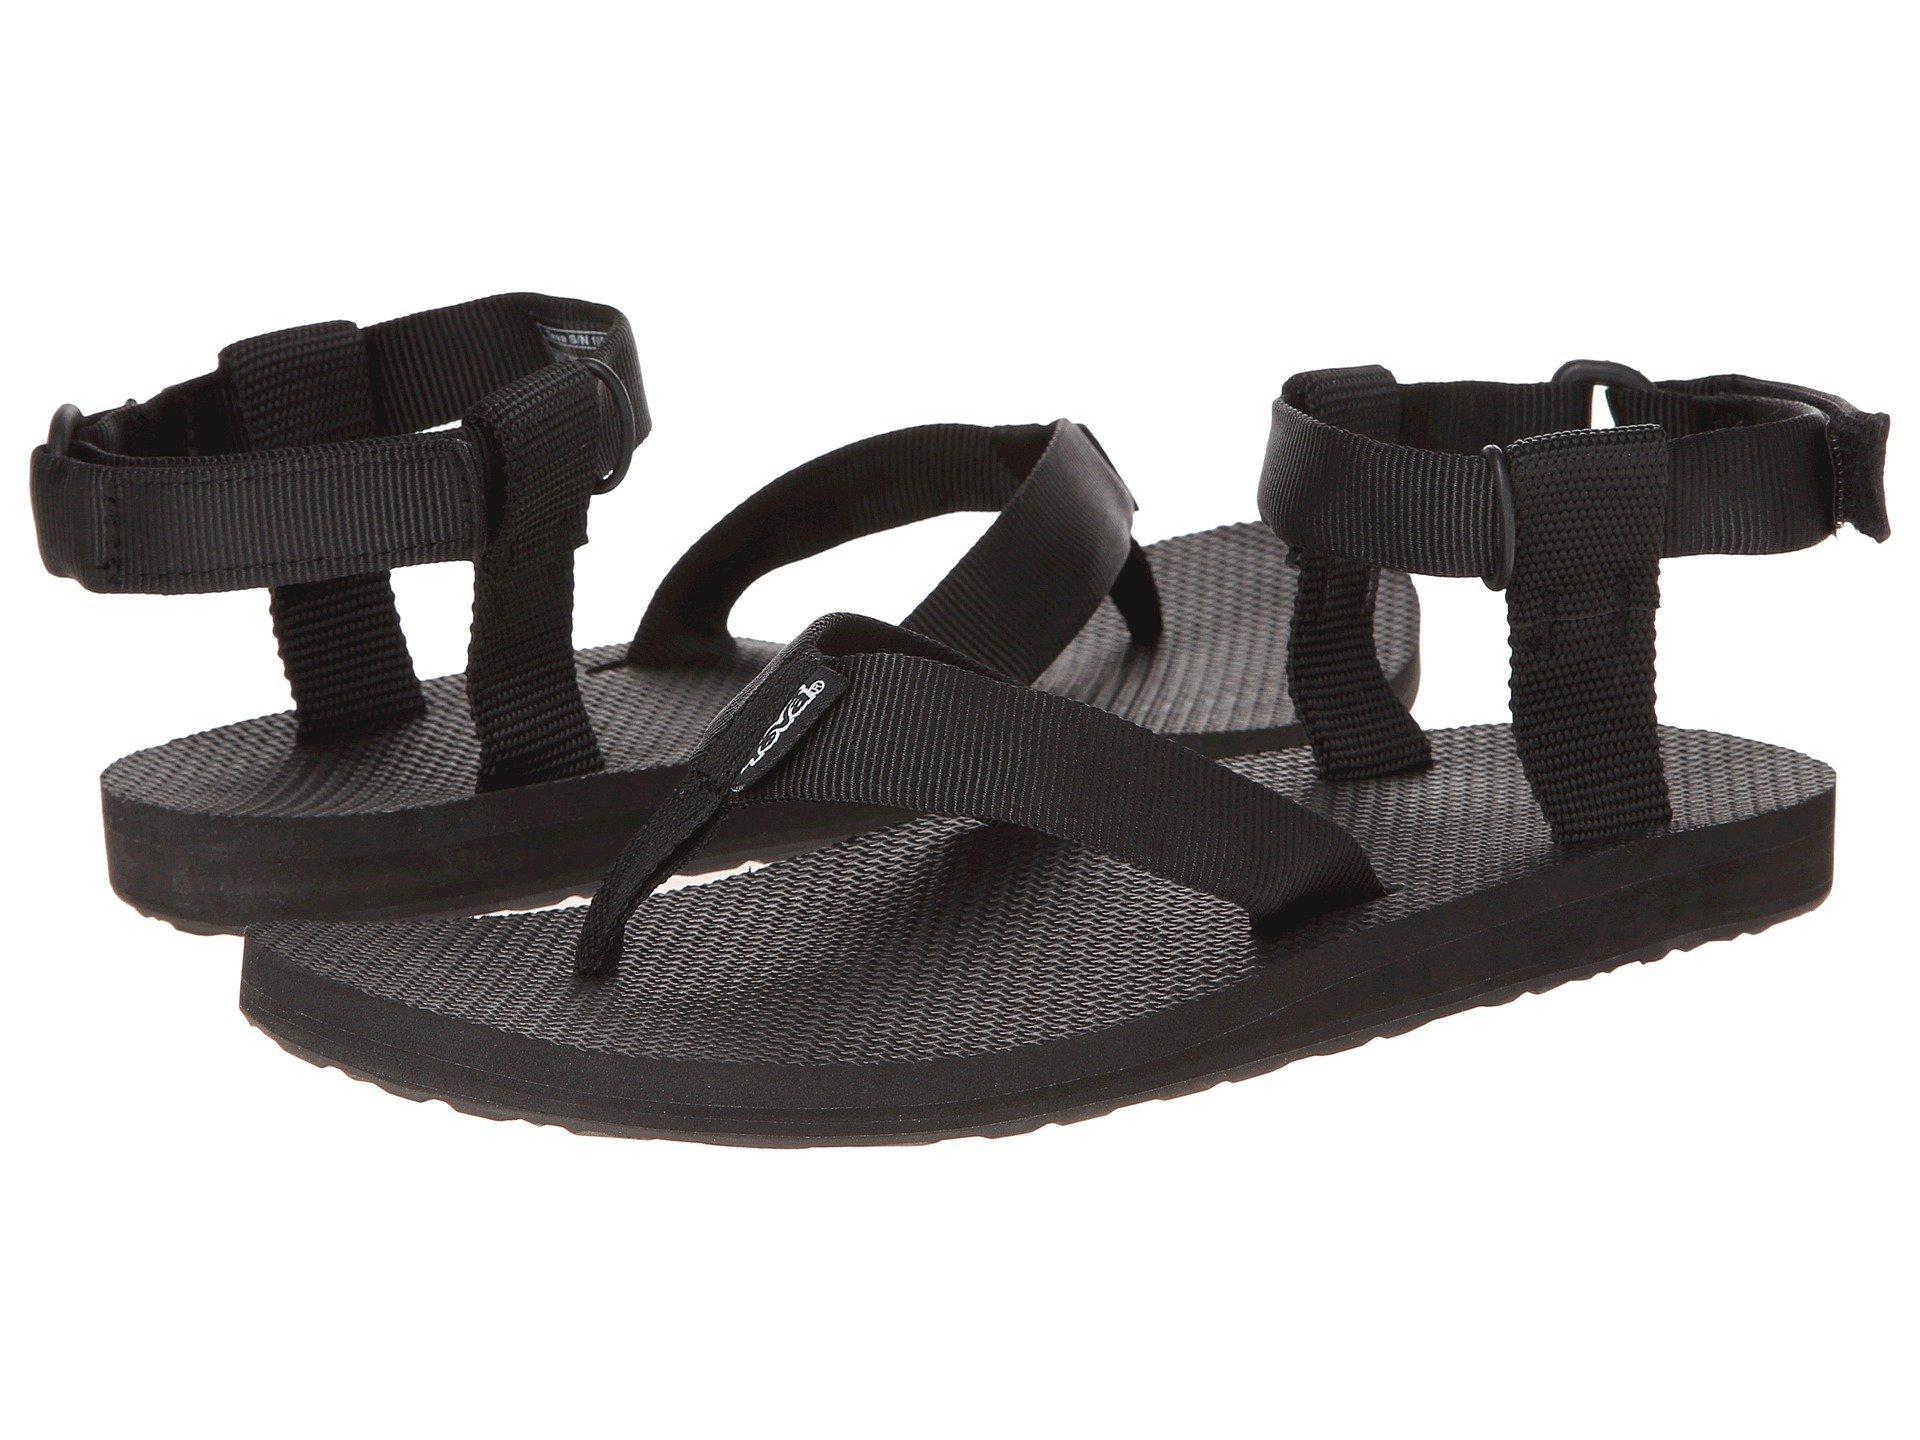 065de689df0a25 Lyst - Teva Original Sandal - Urban (black) Men s Sandals in Black ...